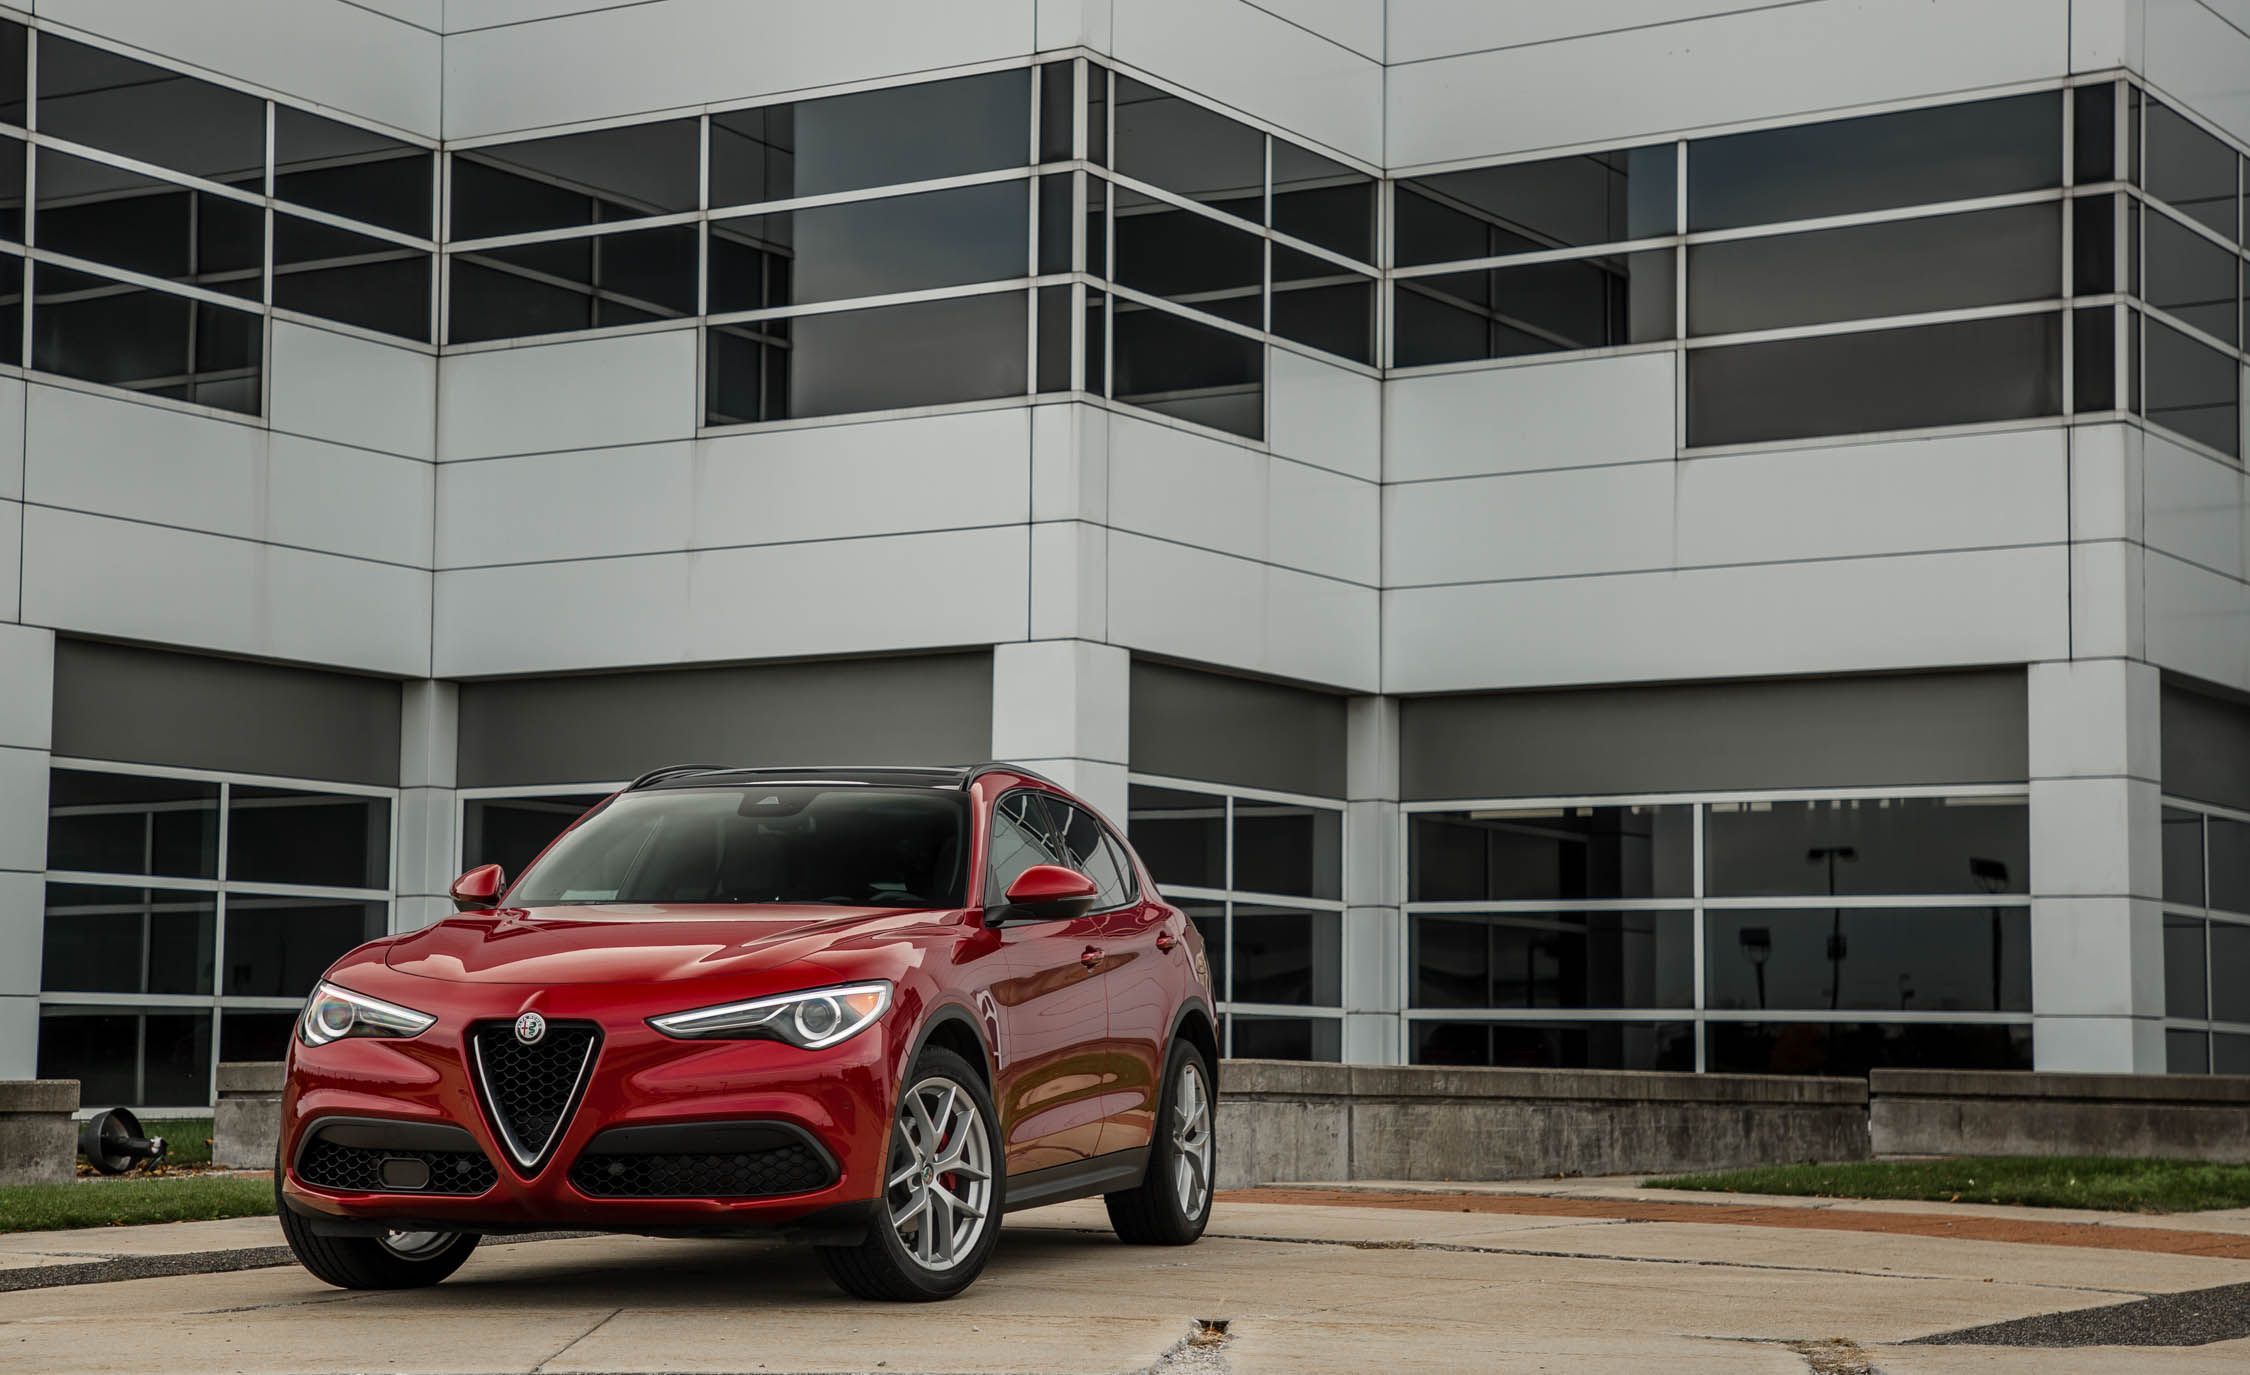 2018 Alfa Romeo Stelvio | Engine and Transmission Review | Car and Driver